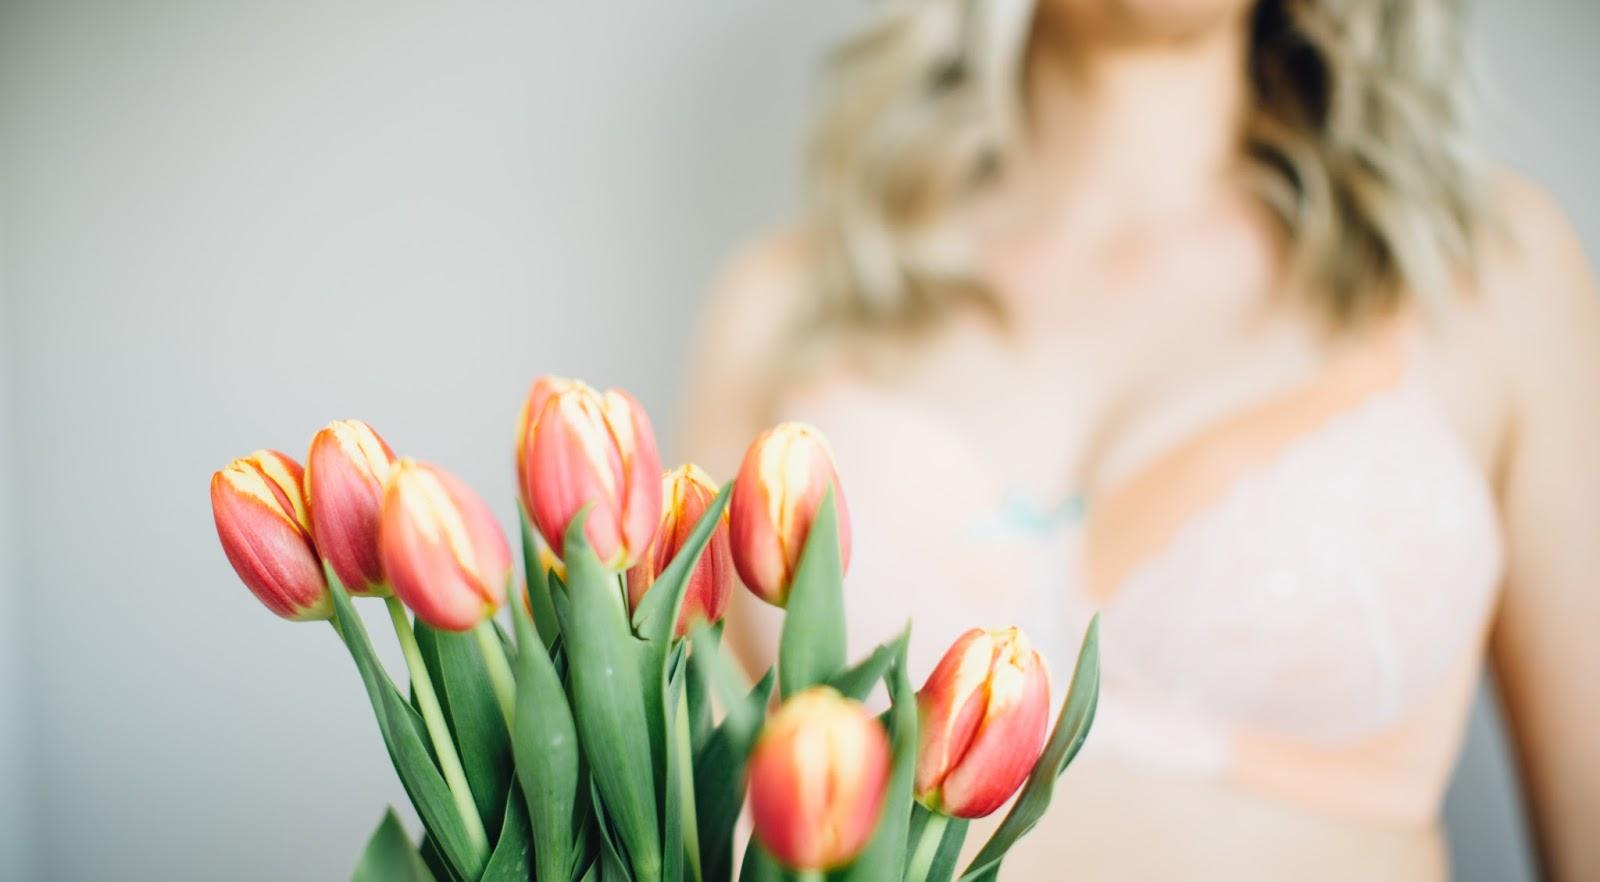 Tulips, Bra, Lace Bra